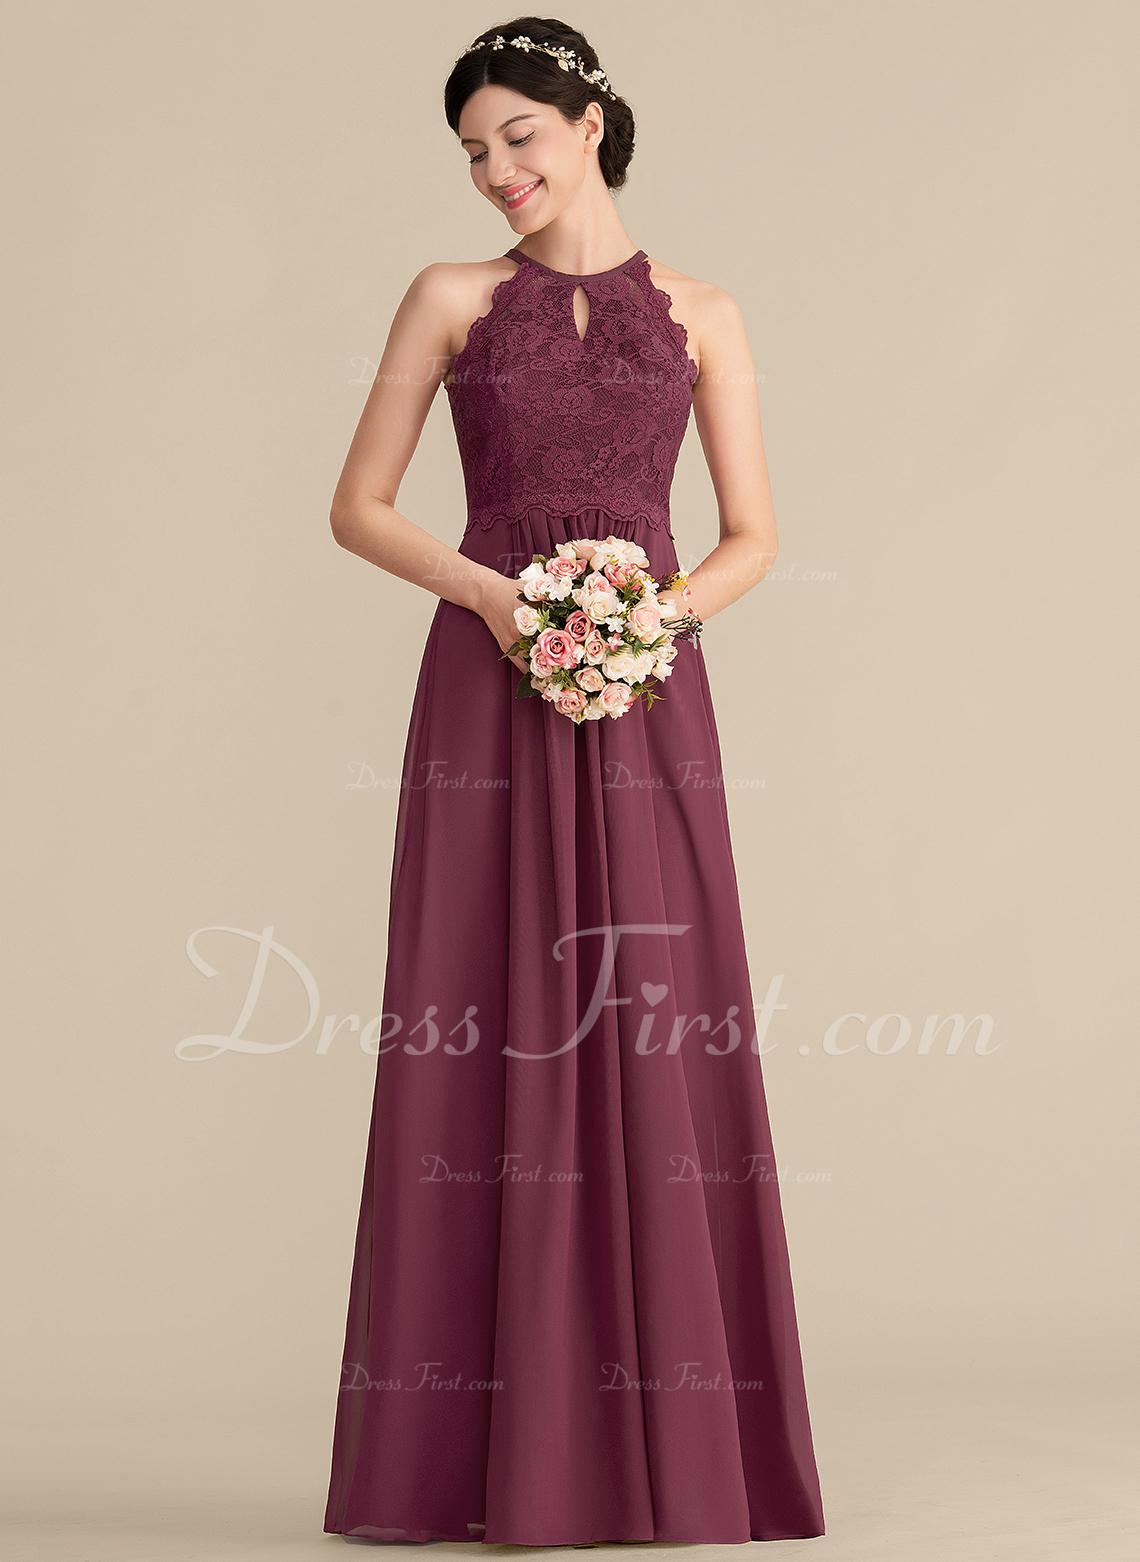 85d8c3a6ecf A-Line Princess Scoop Neck Floor-Length Chiffon Lace Bridesmaid Dress   153307